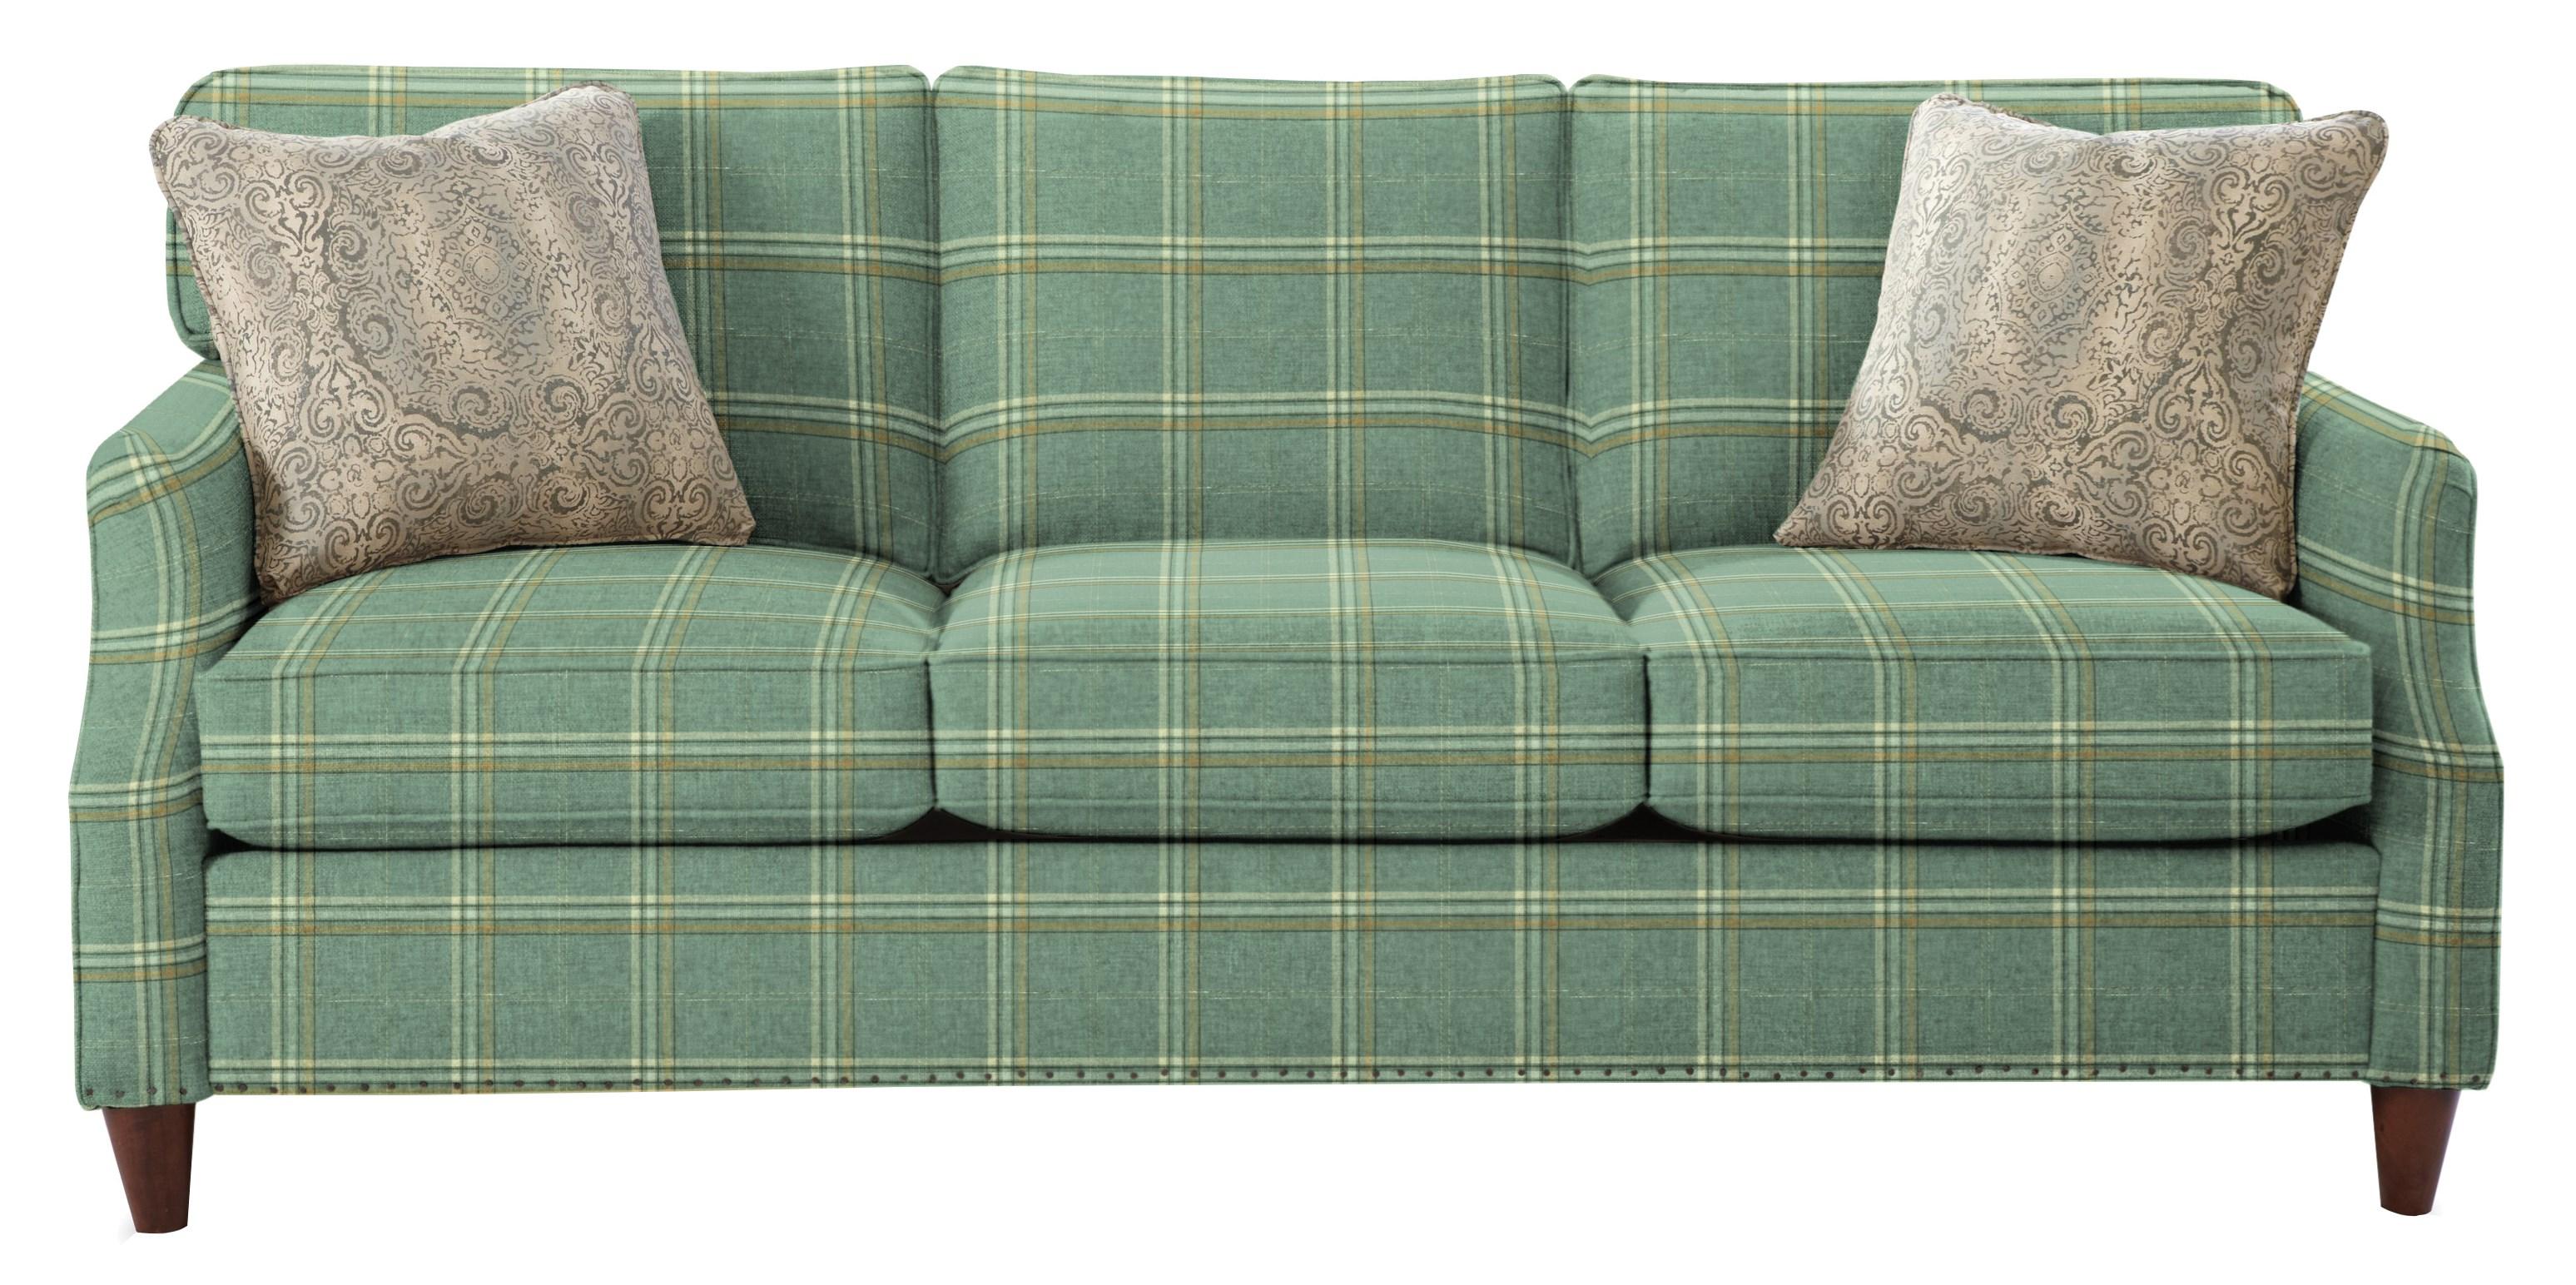 Craftmaster 7363 Sofa - Item Number: 736350-MINUET-21